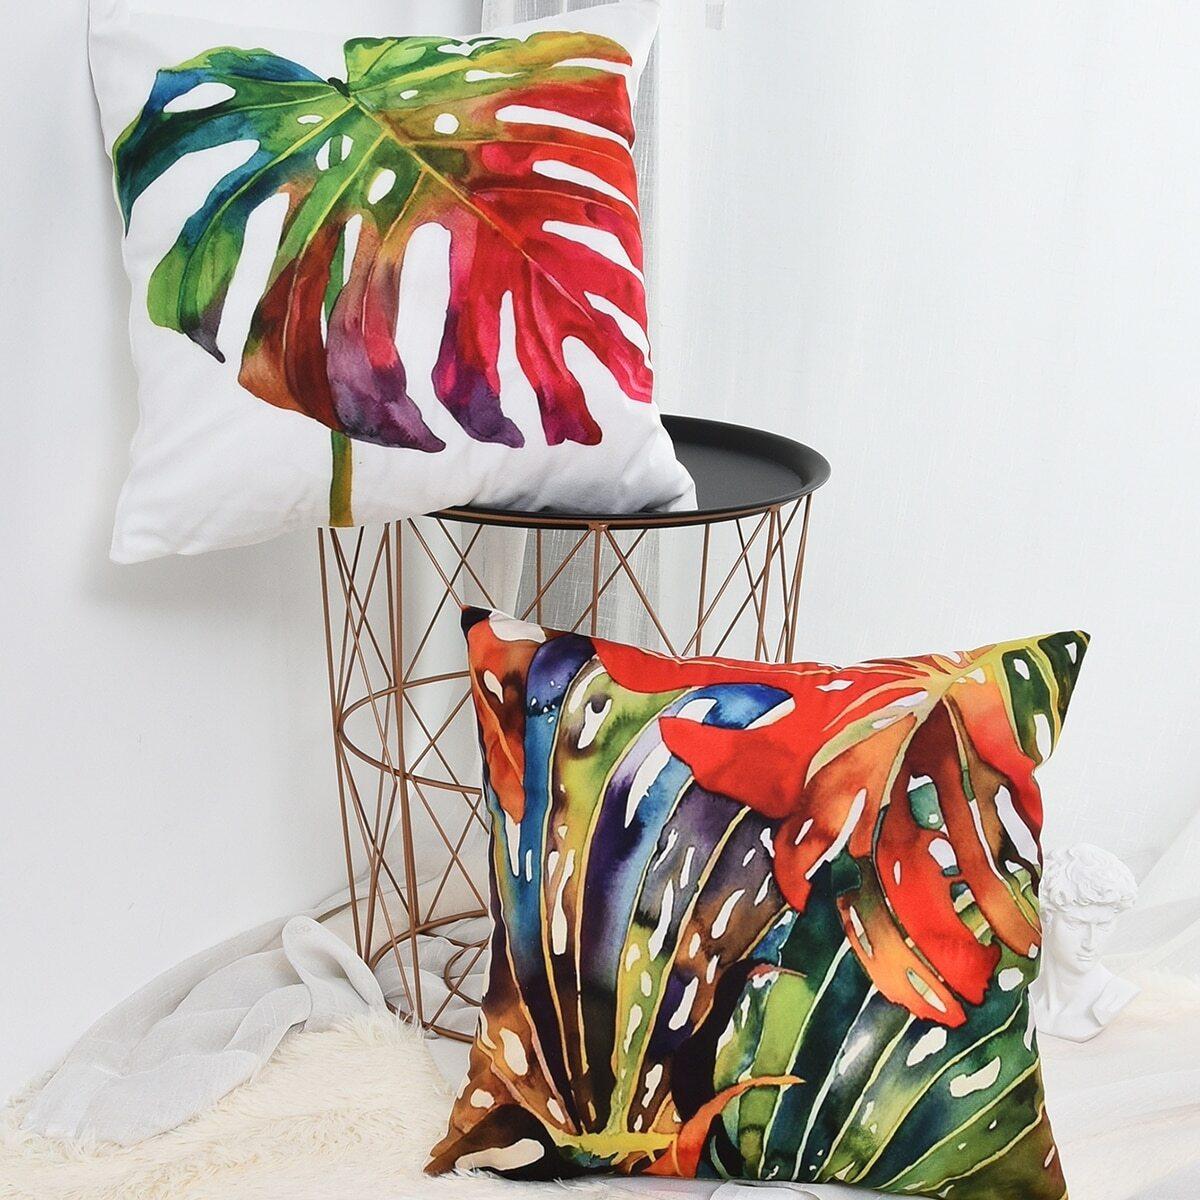 Kissenbezug mit buntem tropischem Blatt Muster 1 Stück